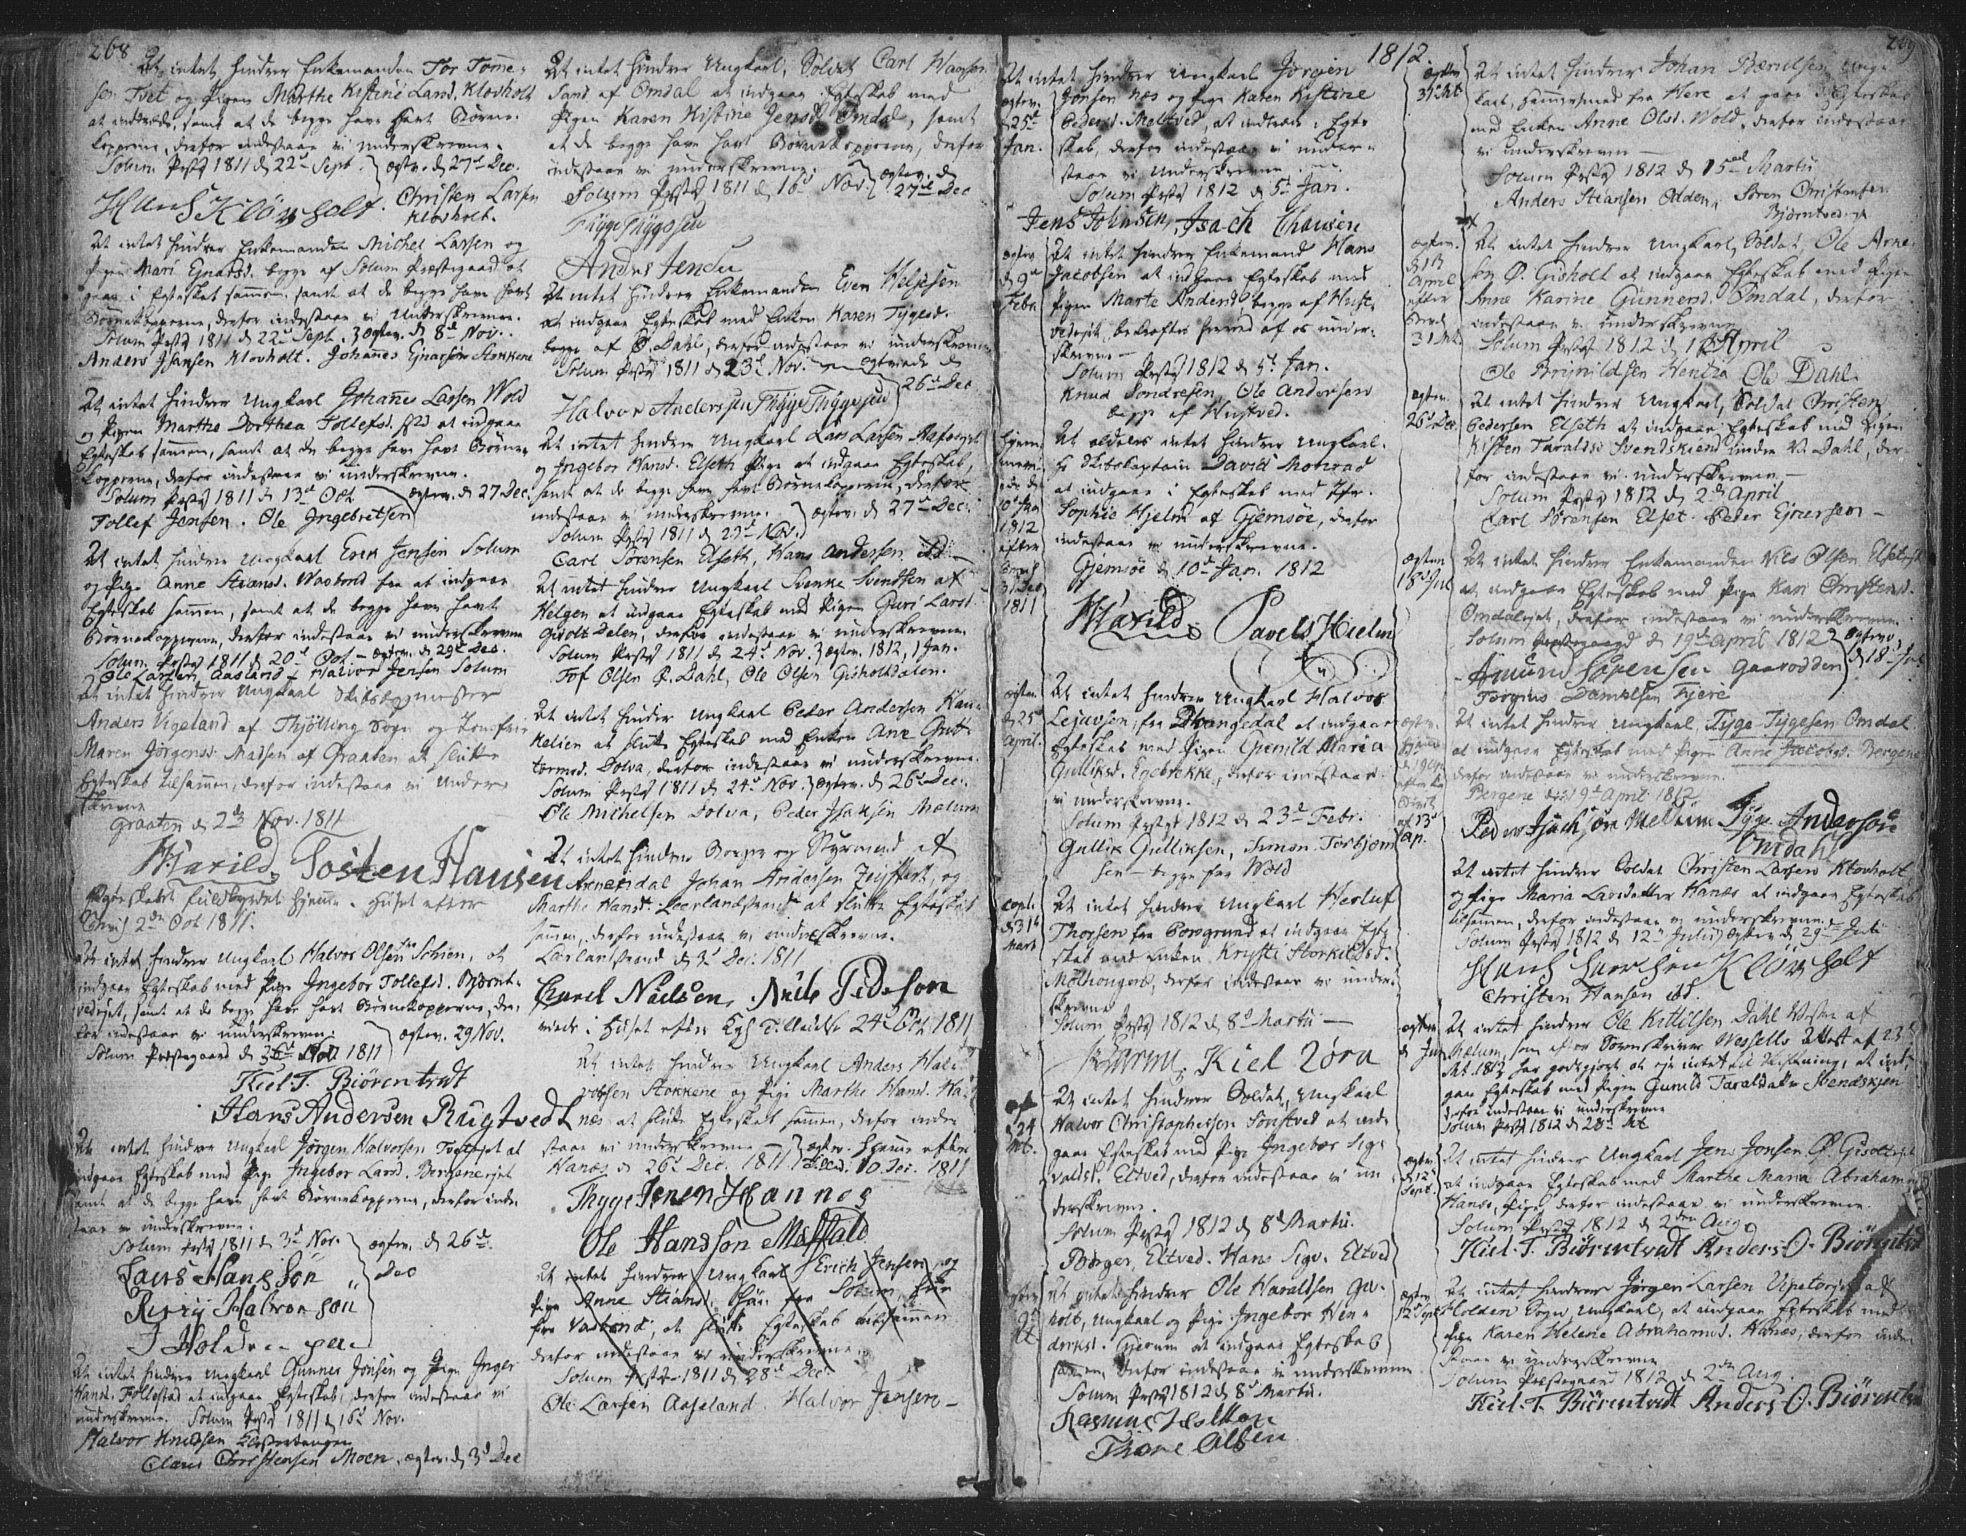 SAKO, Solum kirkebøker, F/Fa/L0003: Ministerialbok nr. I 3, 1761-1814, s. 268-269